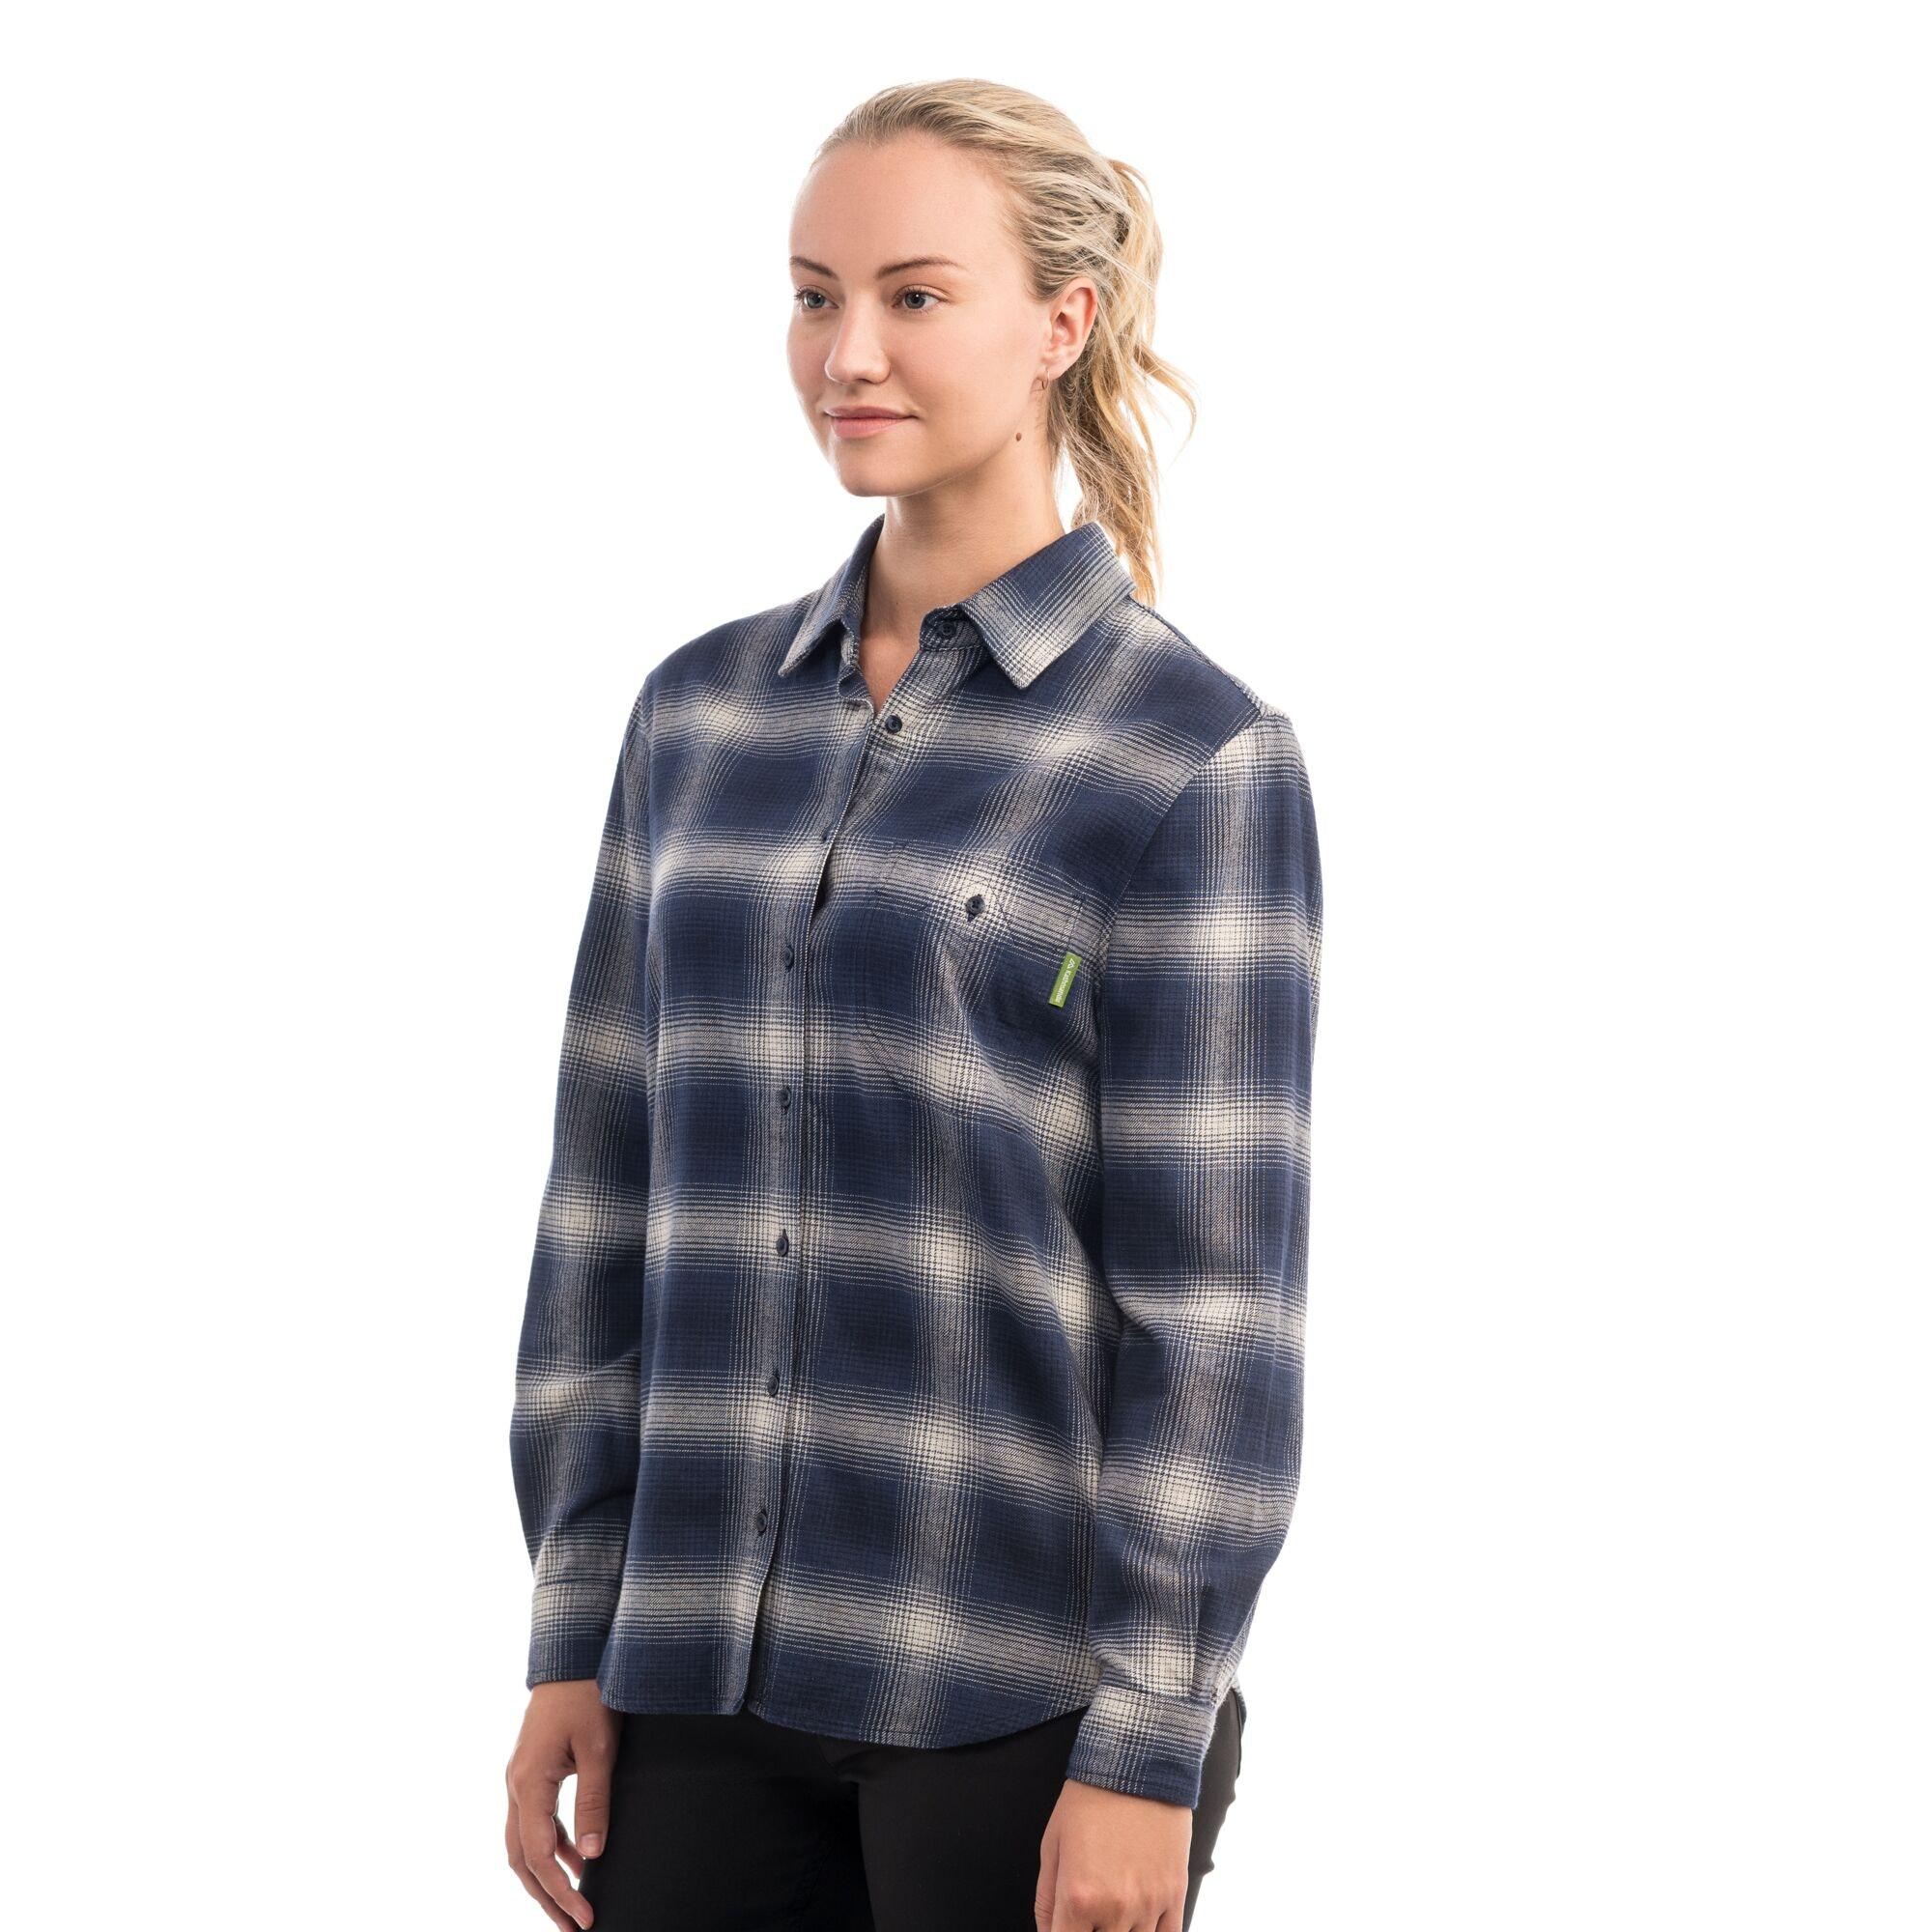 thumbnail 11 - NEW Kathmandu Carrillon Women's Long Sleeve Shirt